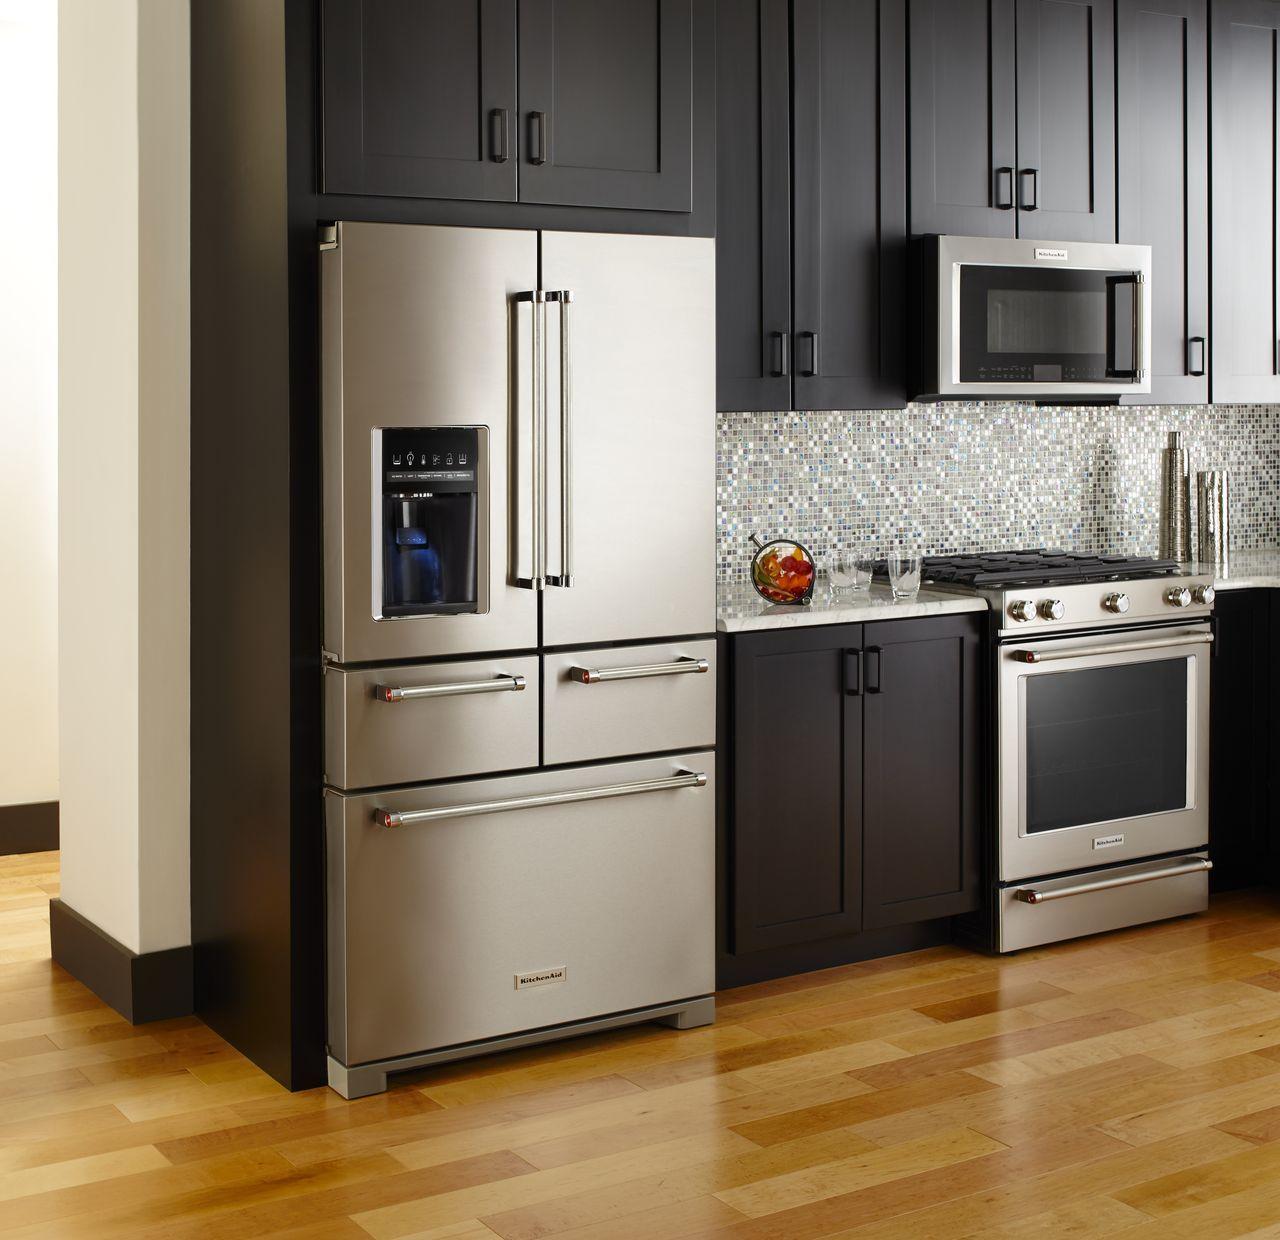 The new KitchenAid® MultiDoor Freestanding Refrigerator